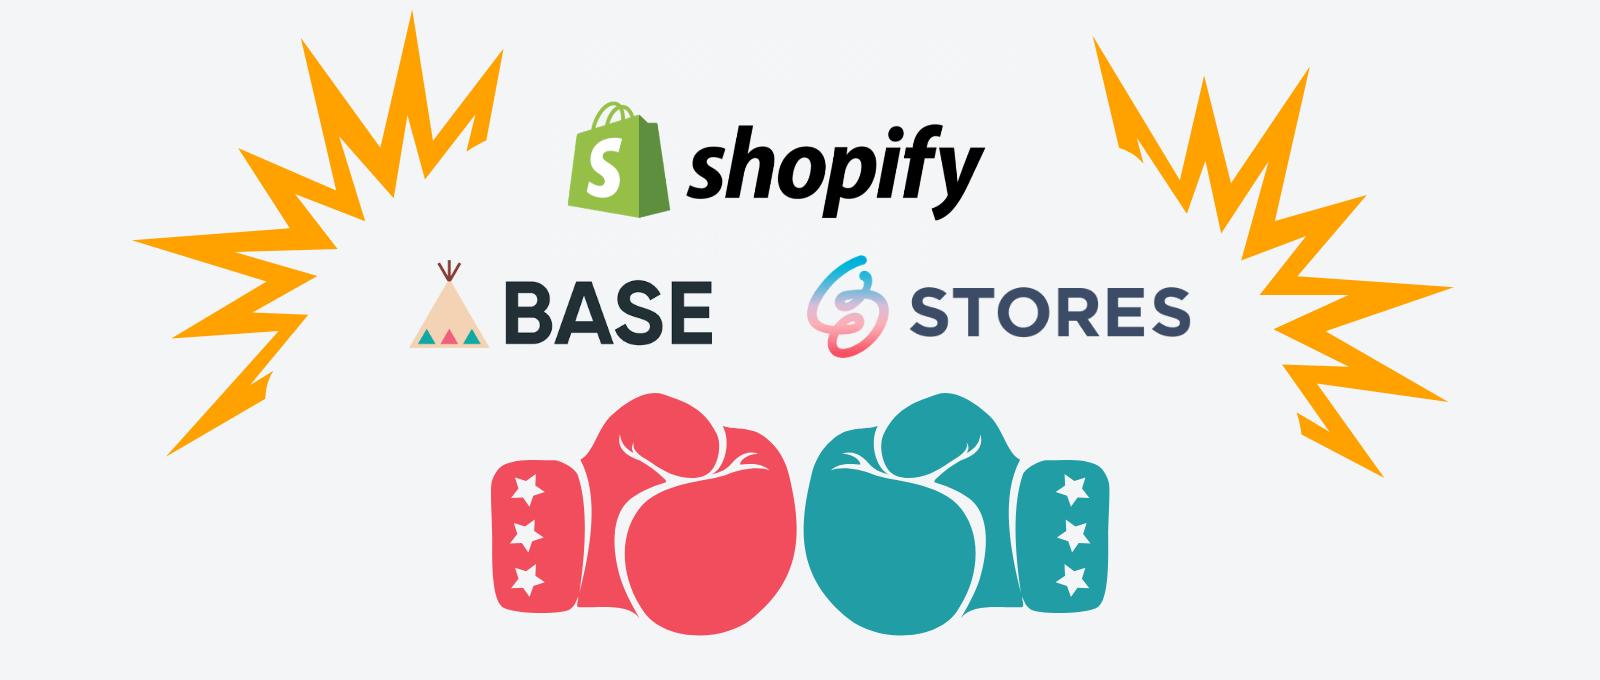 Shopify Base Stores